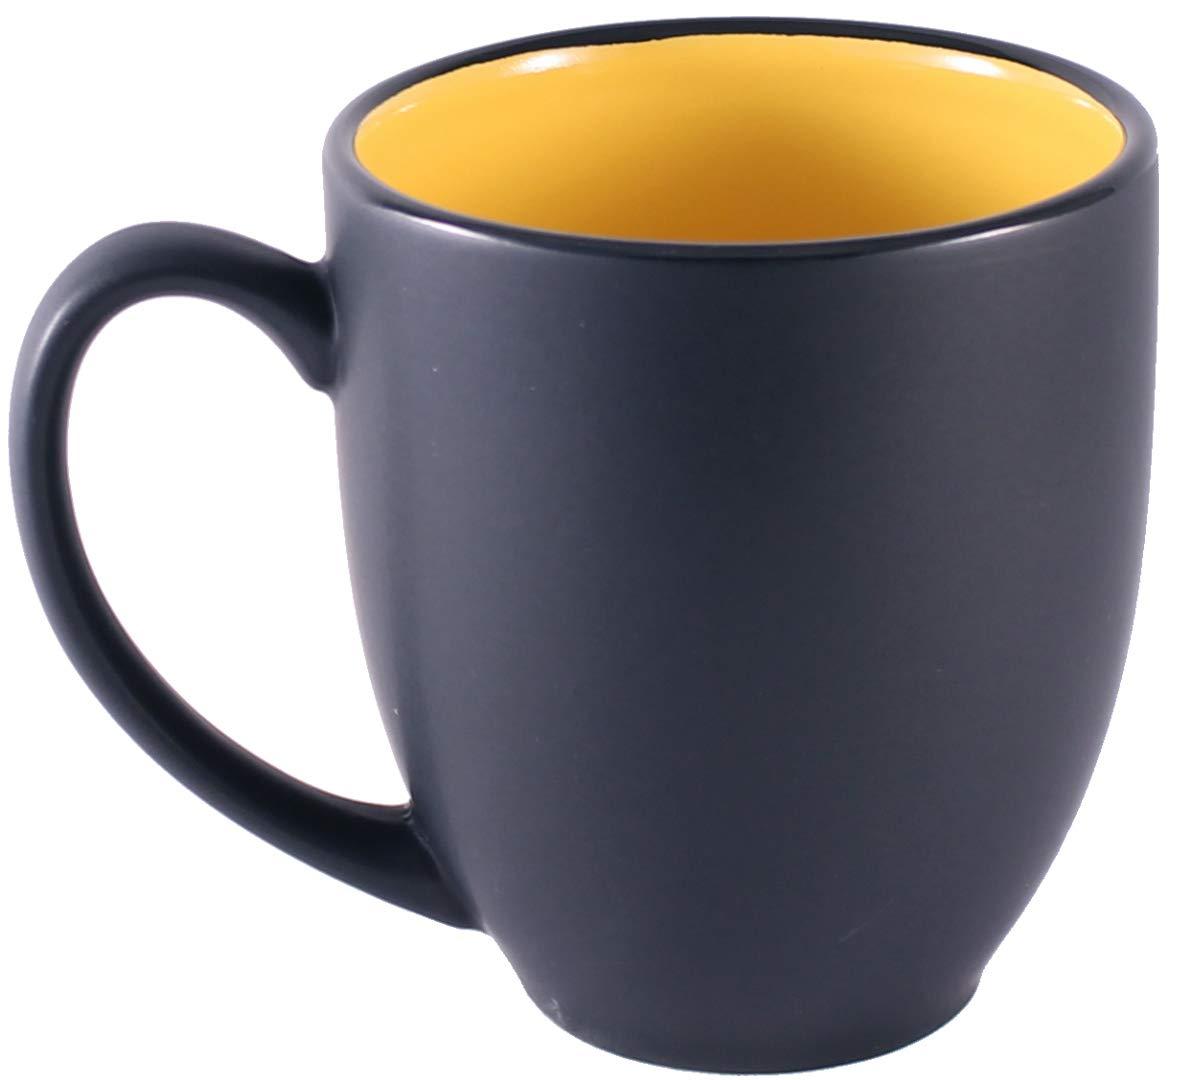 ITI Ceramic Bistro Hilo Coffee Mugs with Pan Scraper 4-Pack, Green 14 Ounce